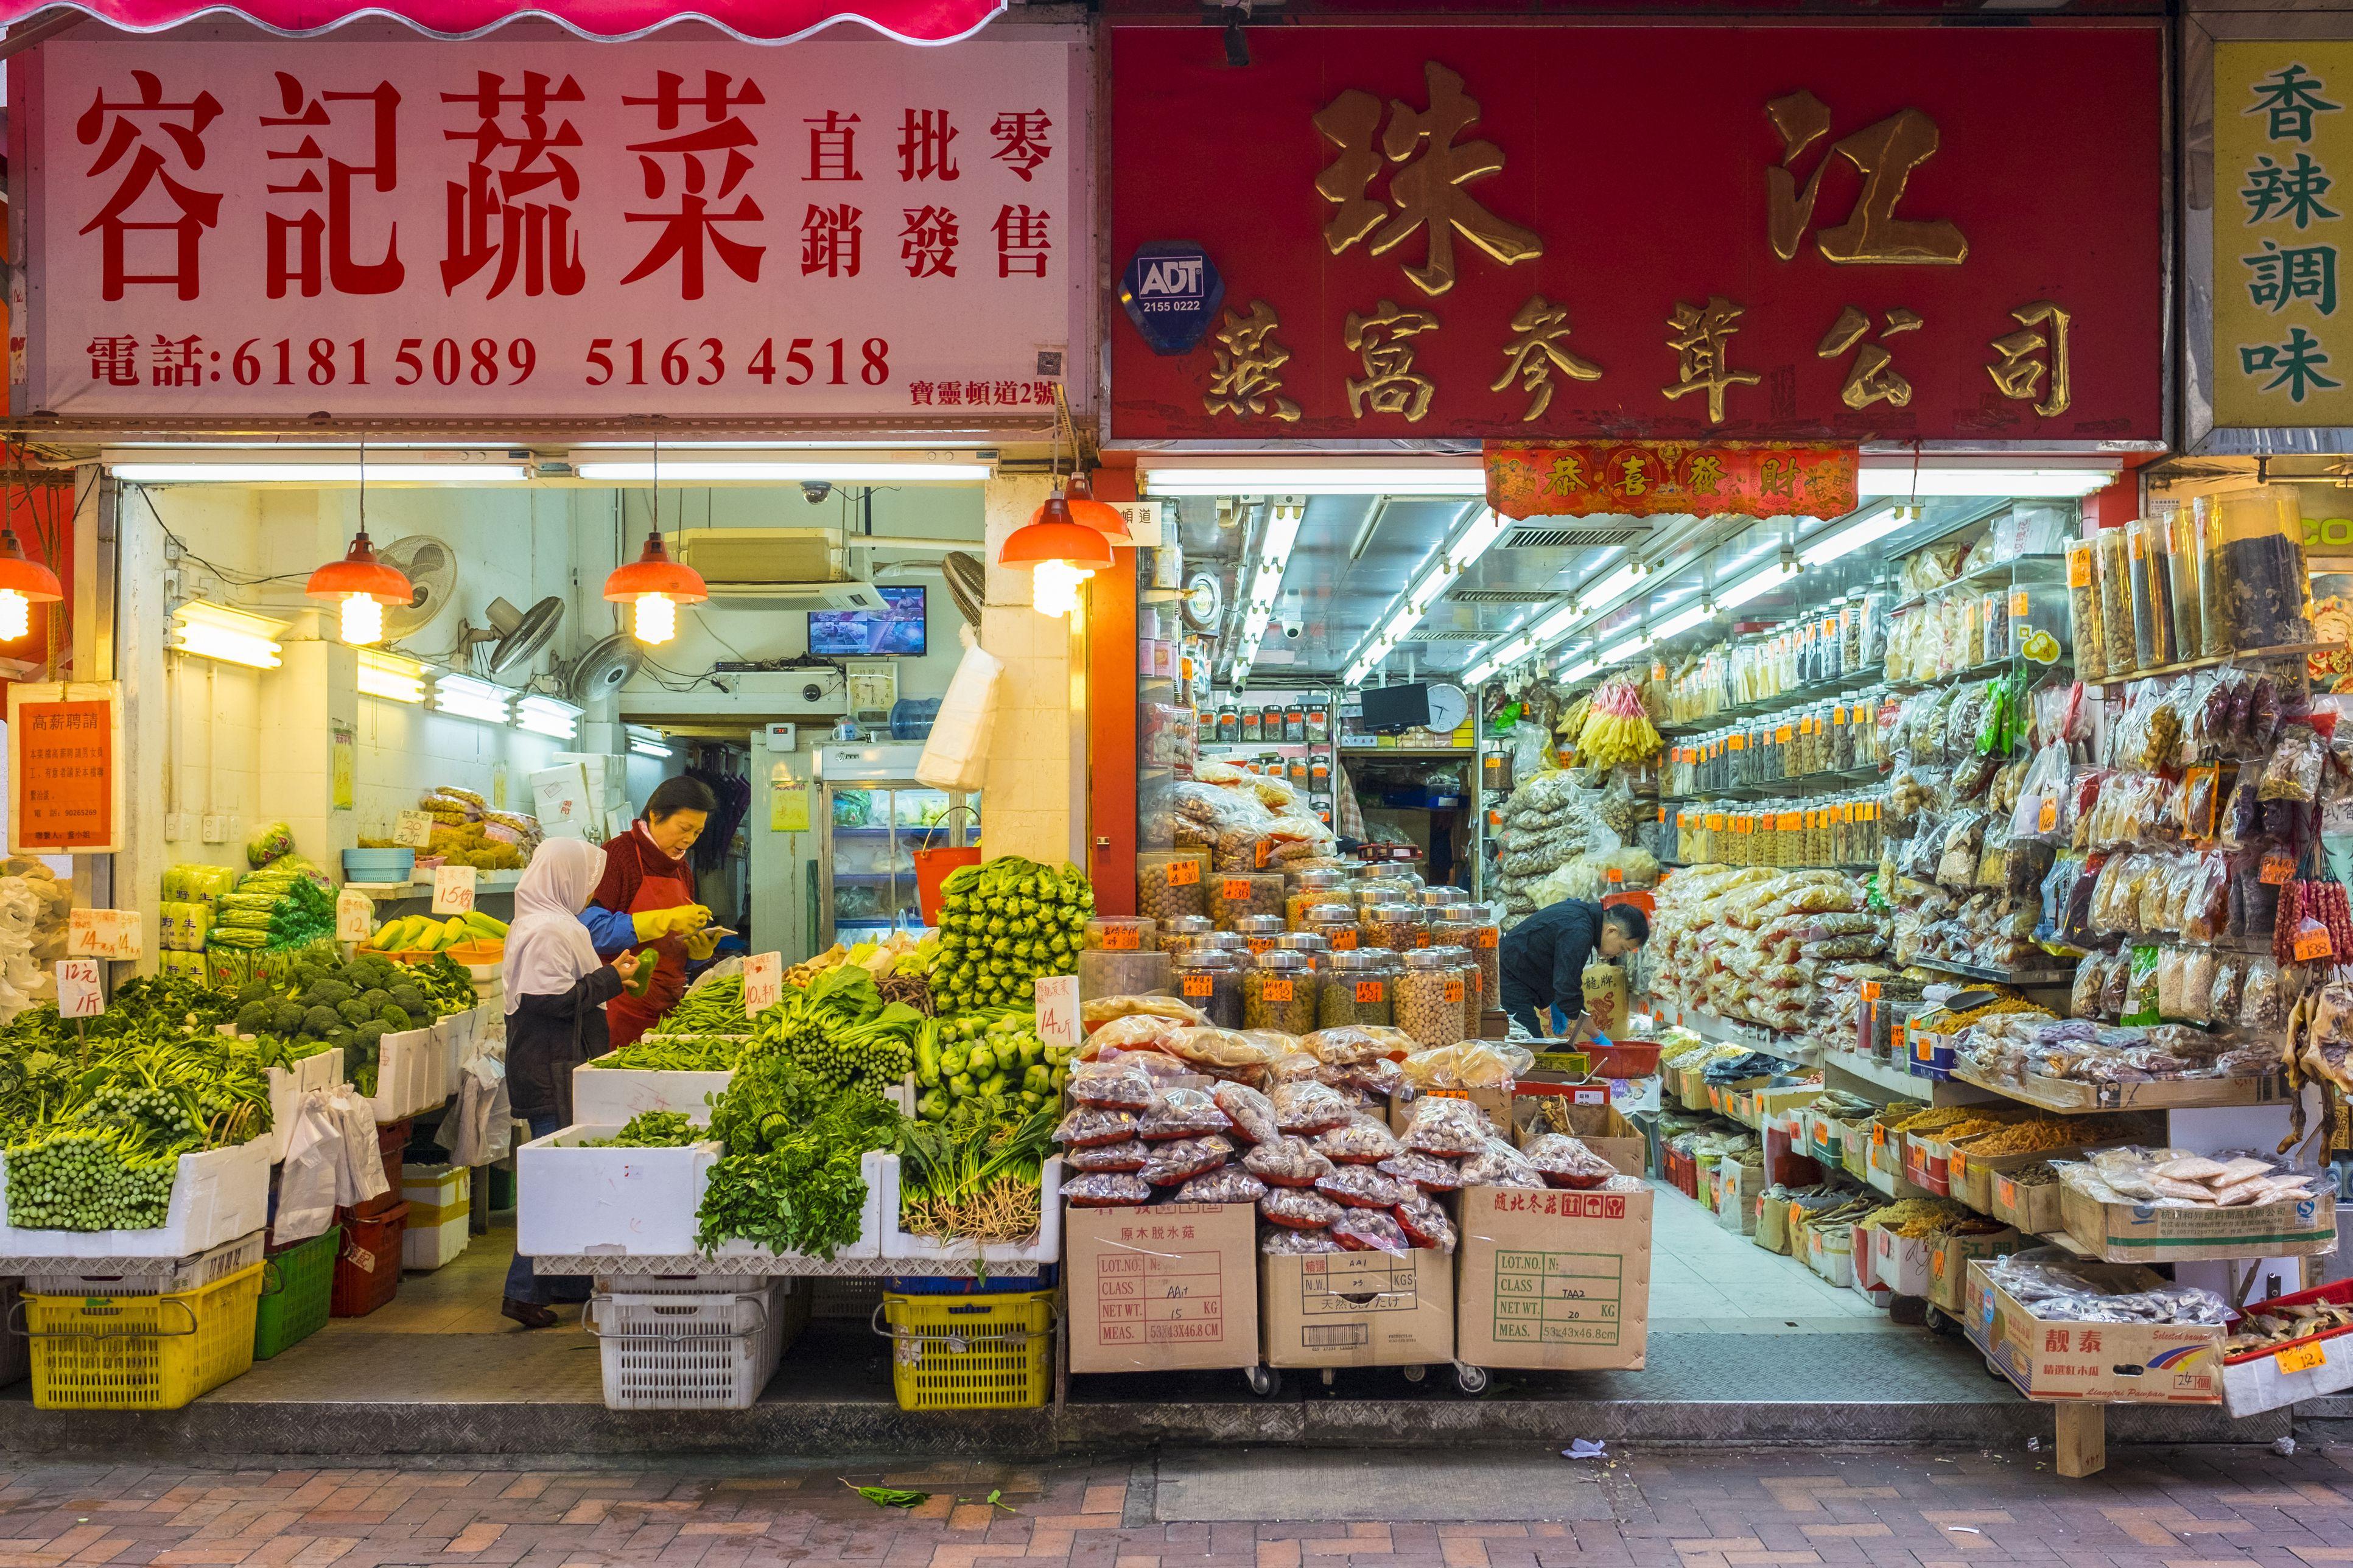 Shops in Bowrington Road Market, Wan Chai, Hong Kong